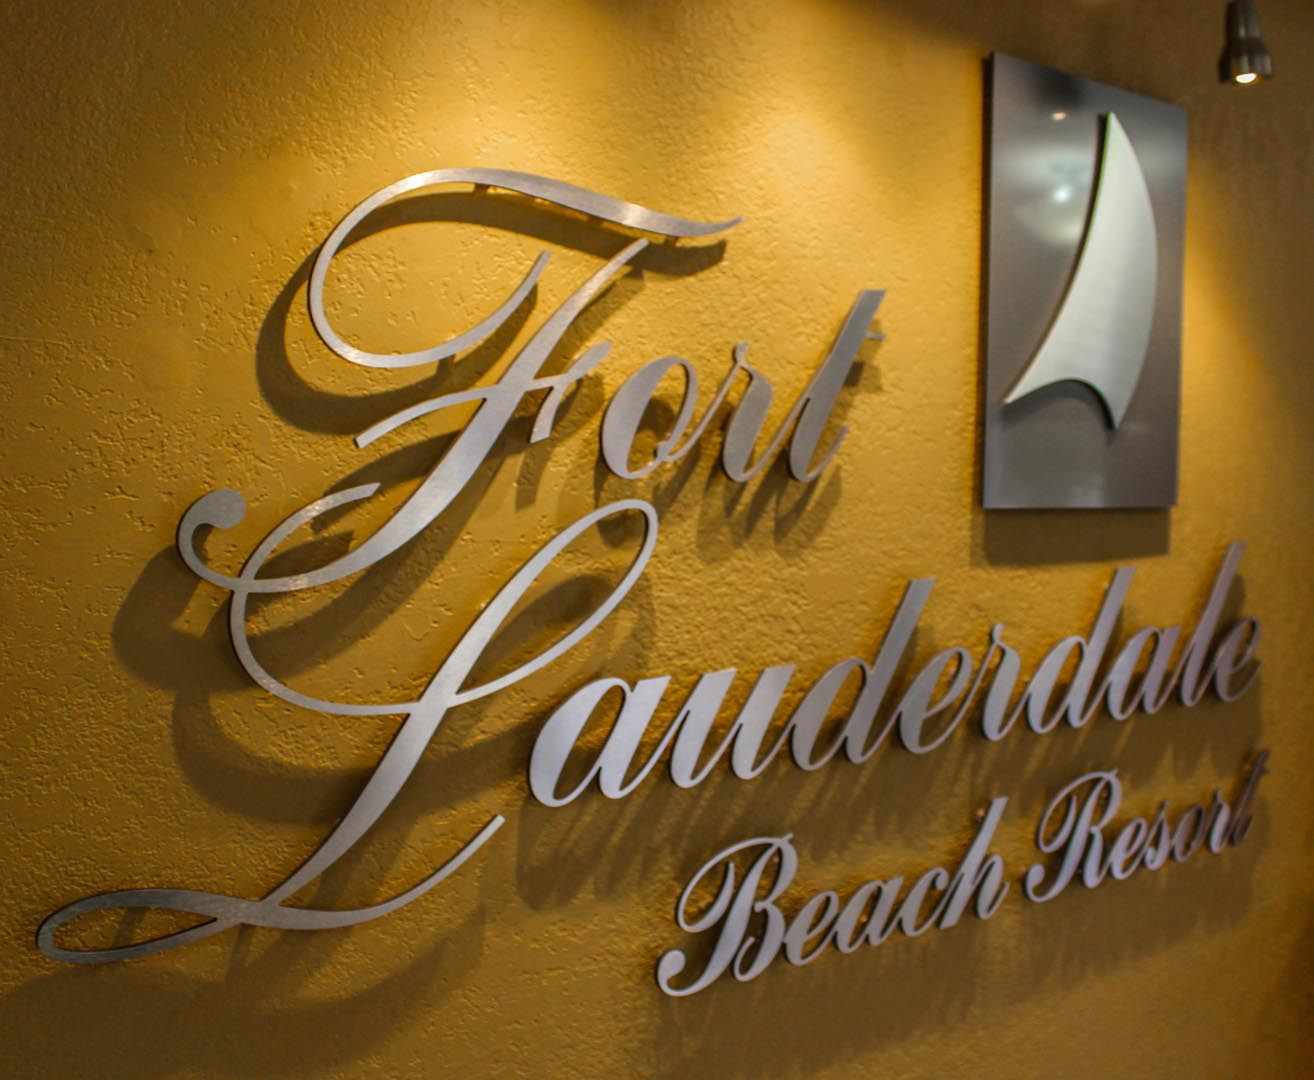 Ft Lauderdale Beach Resort Club Signage